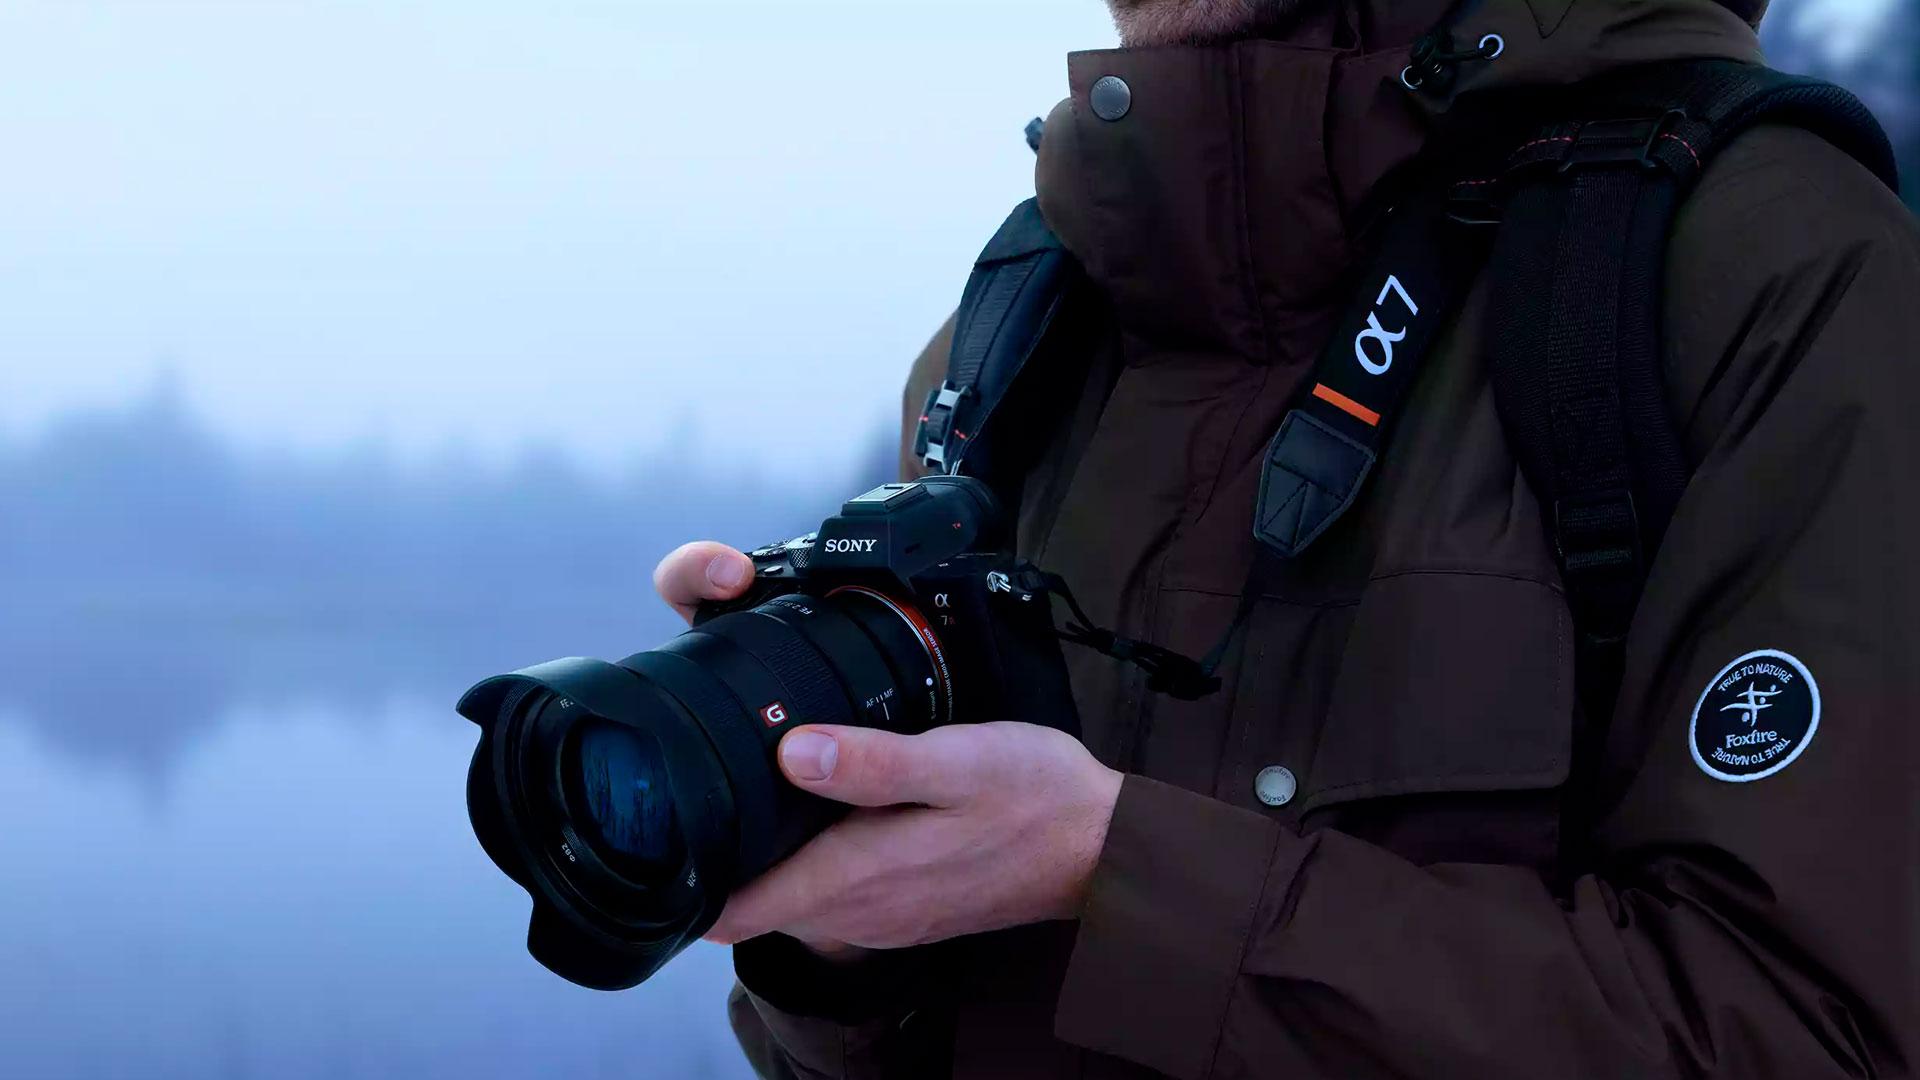 Sony introduces a7R IIIa and a7R IVa cameras | Photofocus